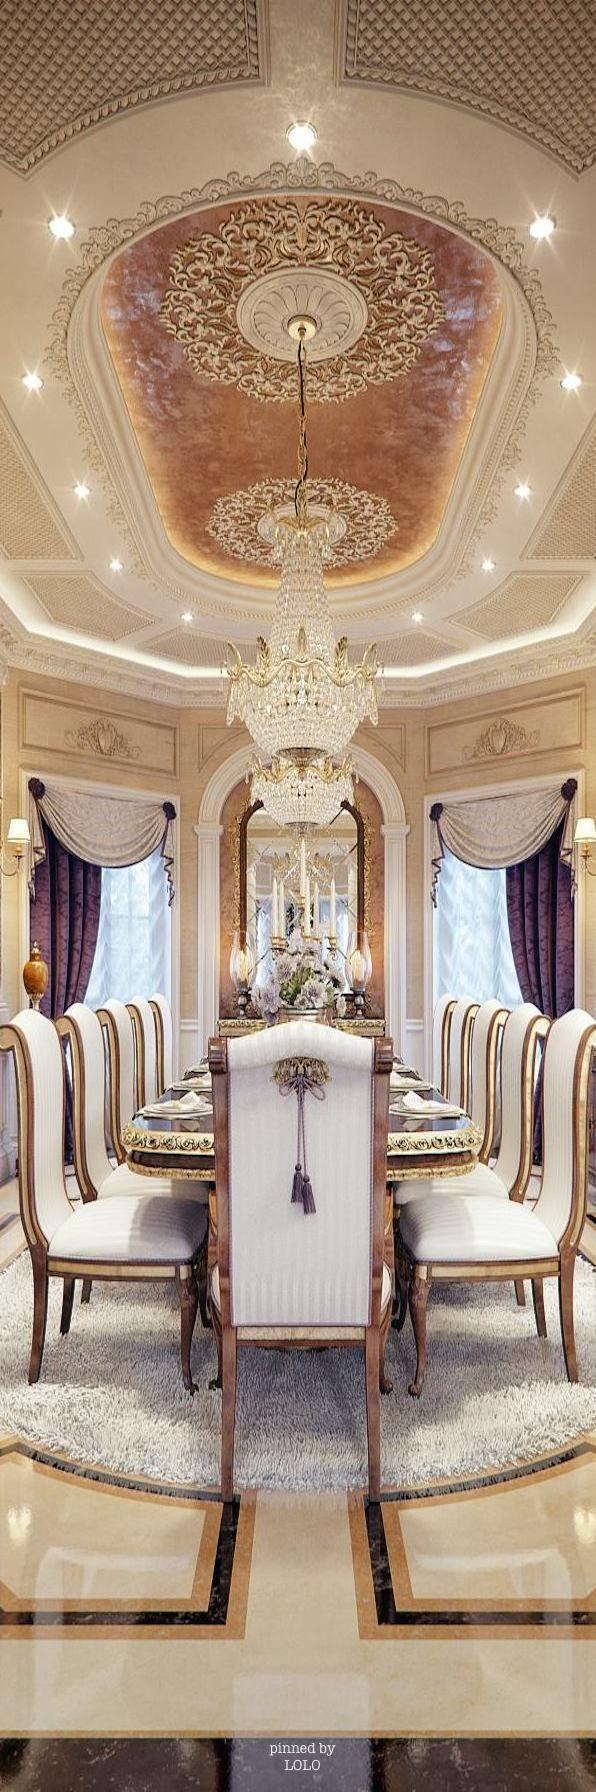 Best 25+ Elegant dining ideas on Pinterest | Elegant ...